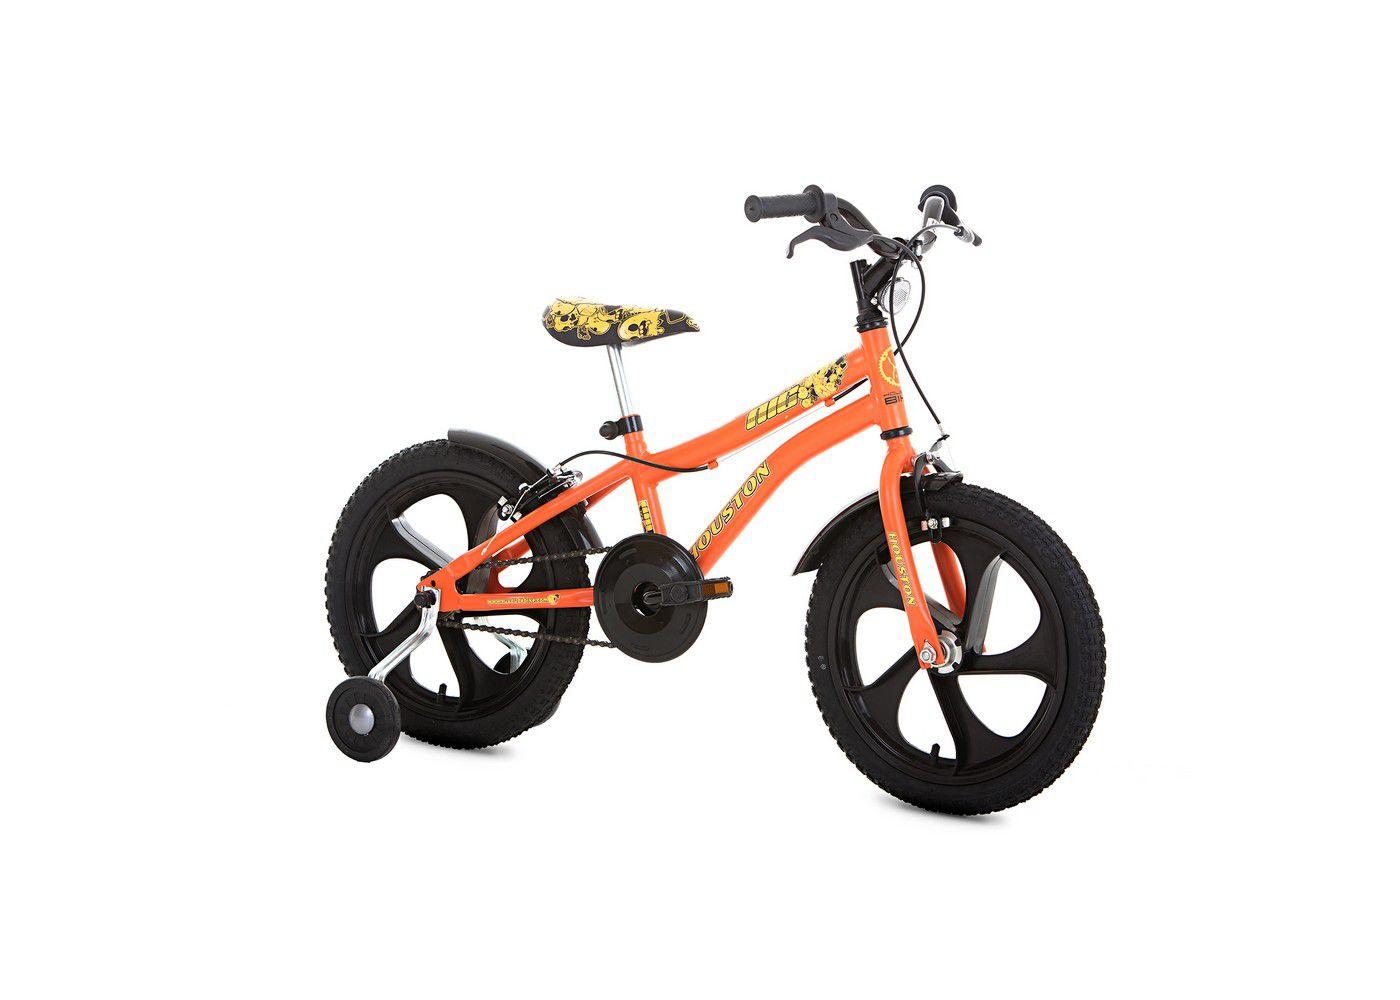 Bicicleta infantil Aro 16 Masculina Nic - Houston